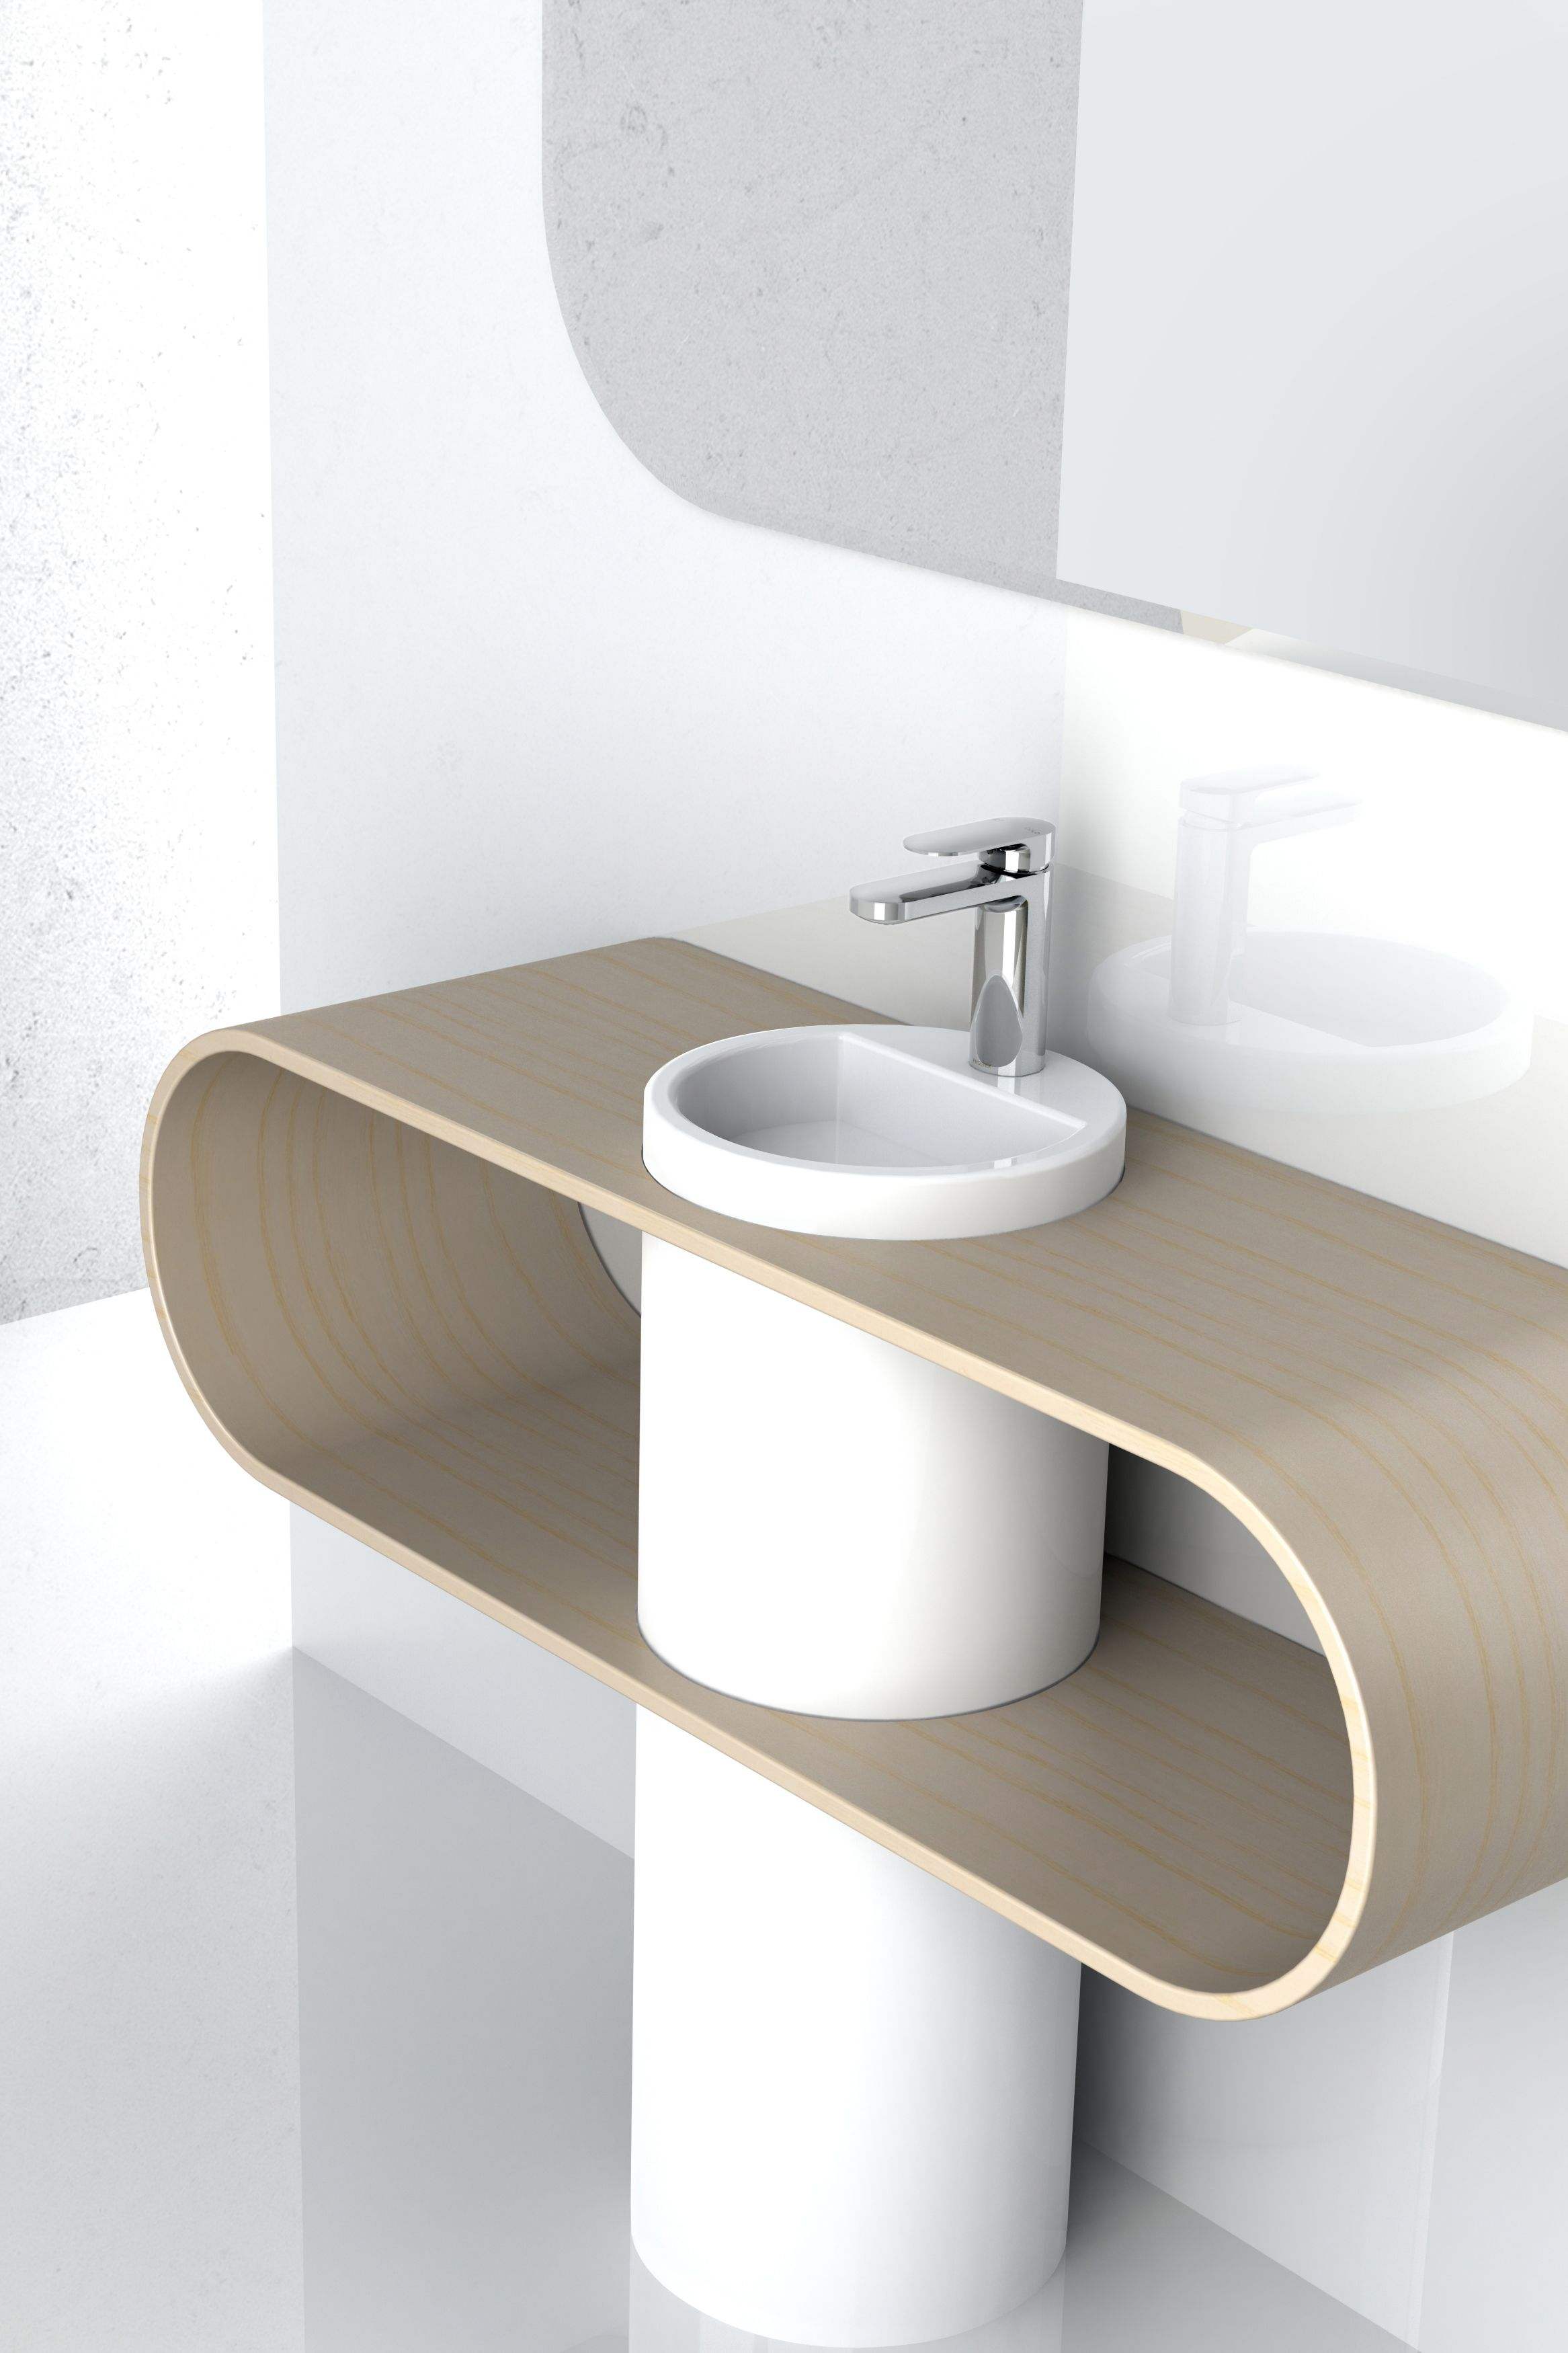 Phoenix Tapware Cerchio Basin Mixer - bathroom taps inspiration ...